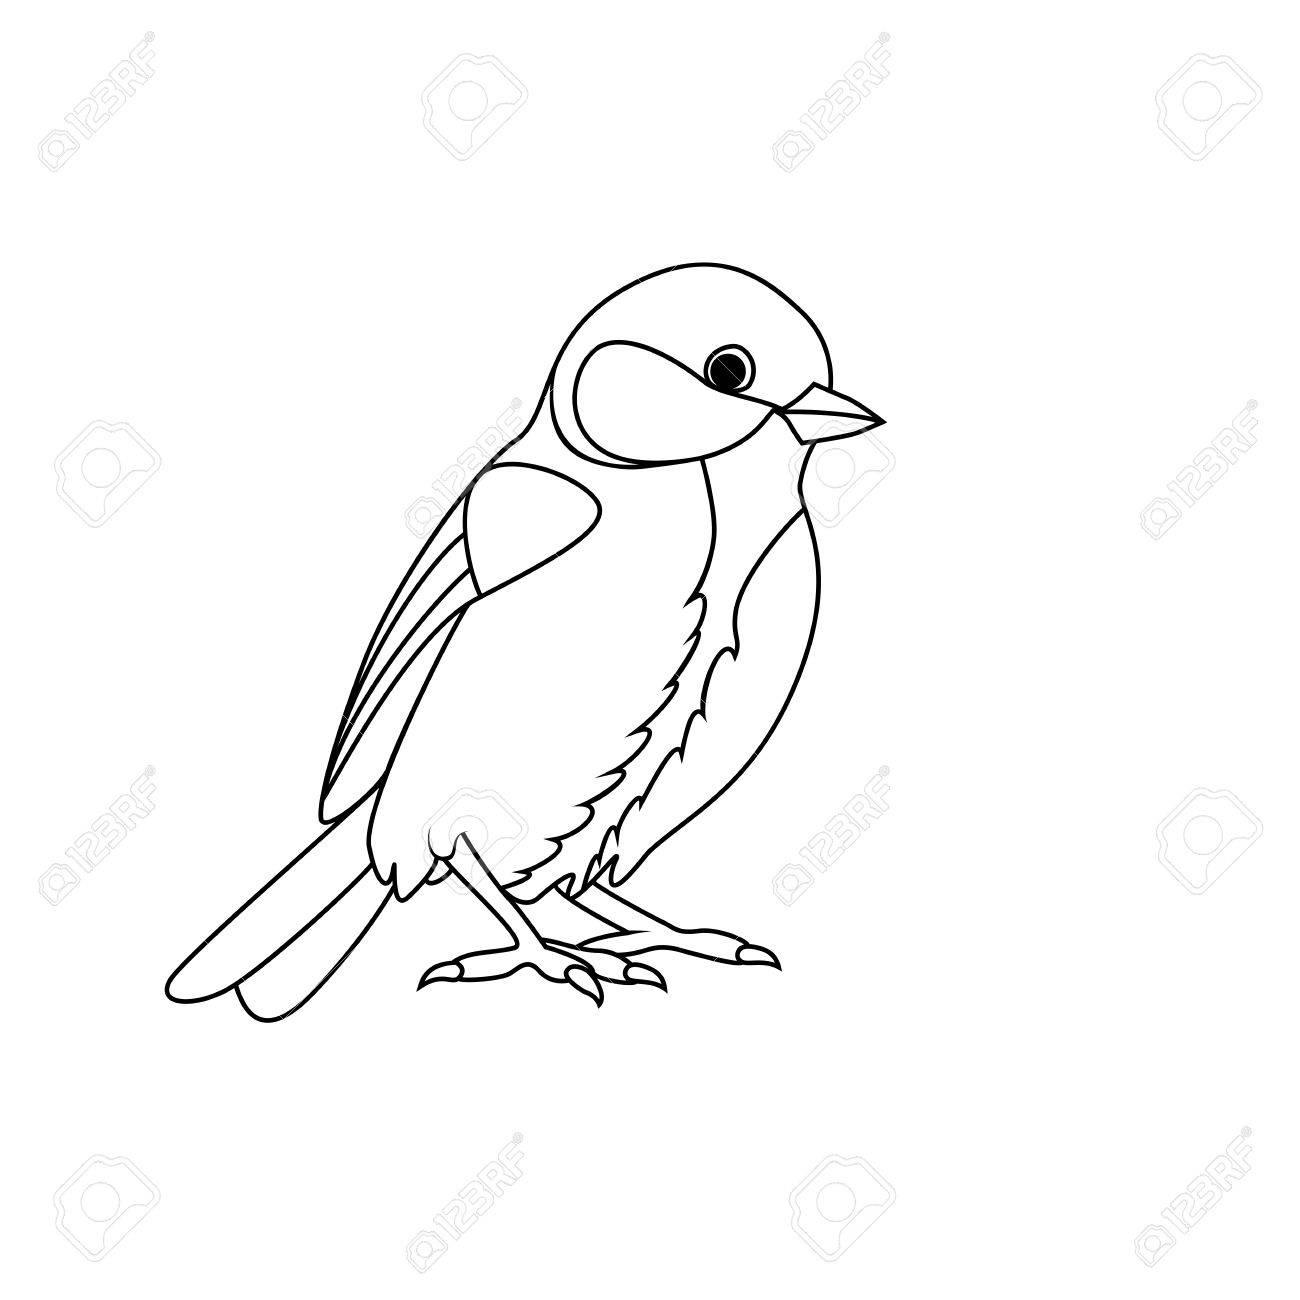 1300x1300 Bird Drawing Stock Photos. Royalty Free Business Images